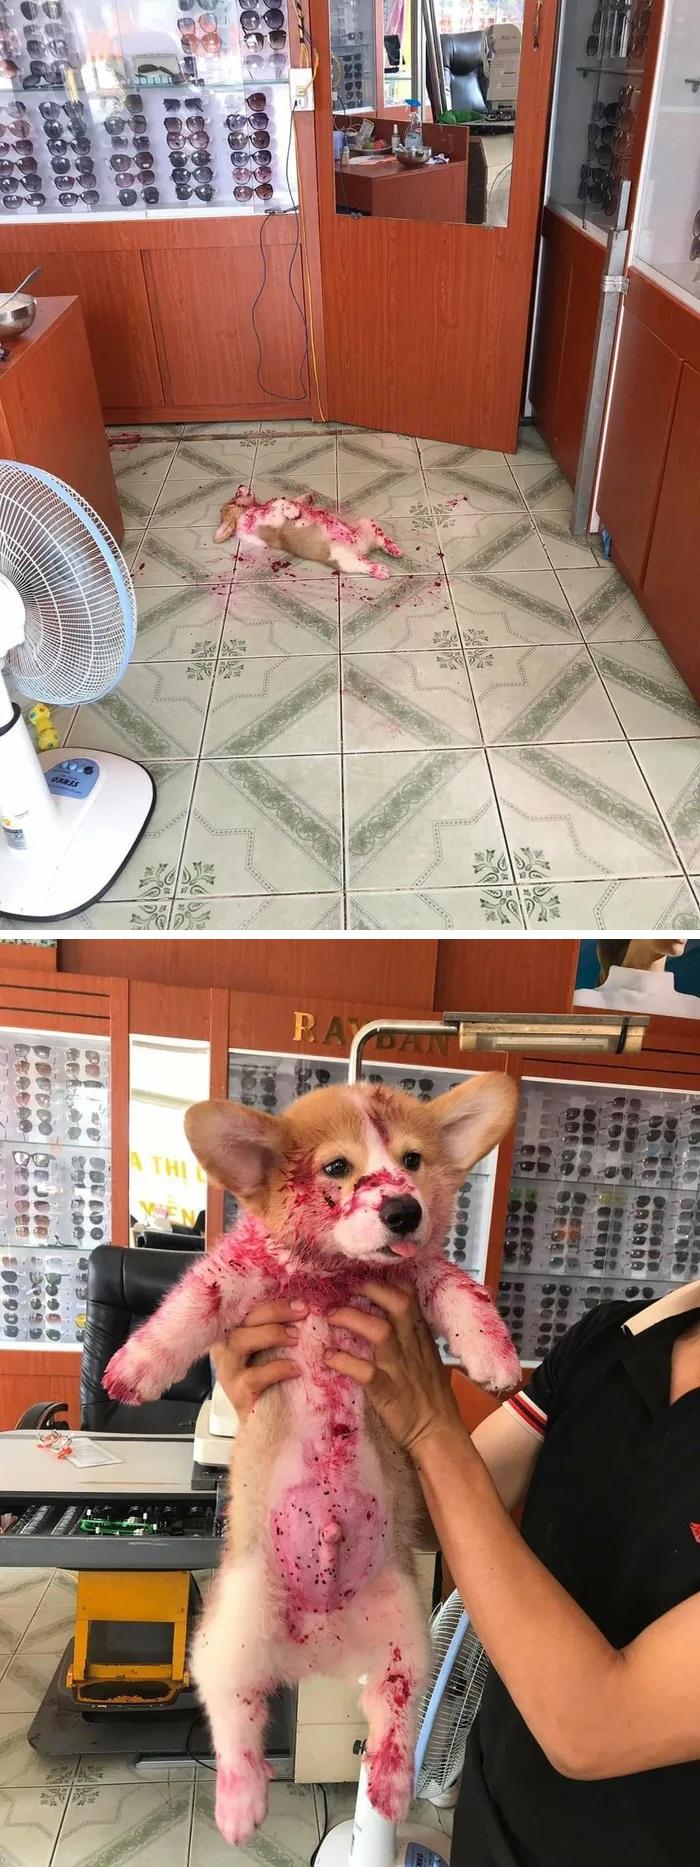 funny dog posts strawberry jam crime